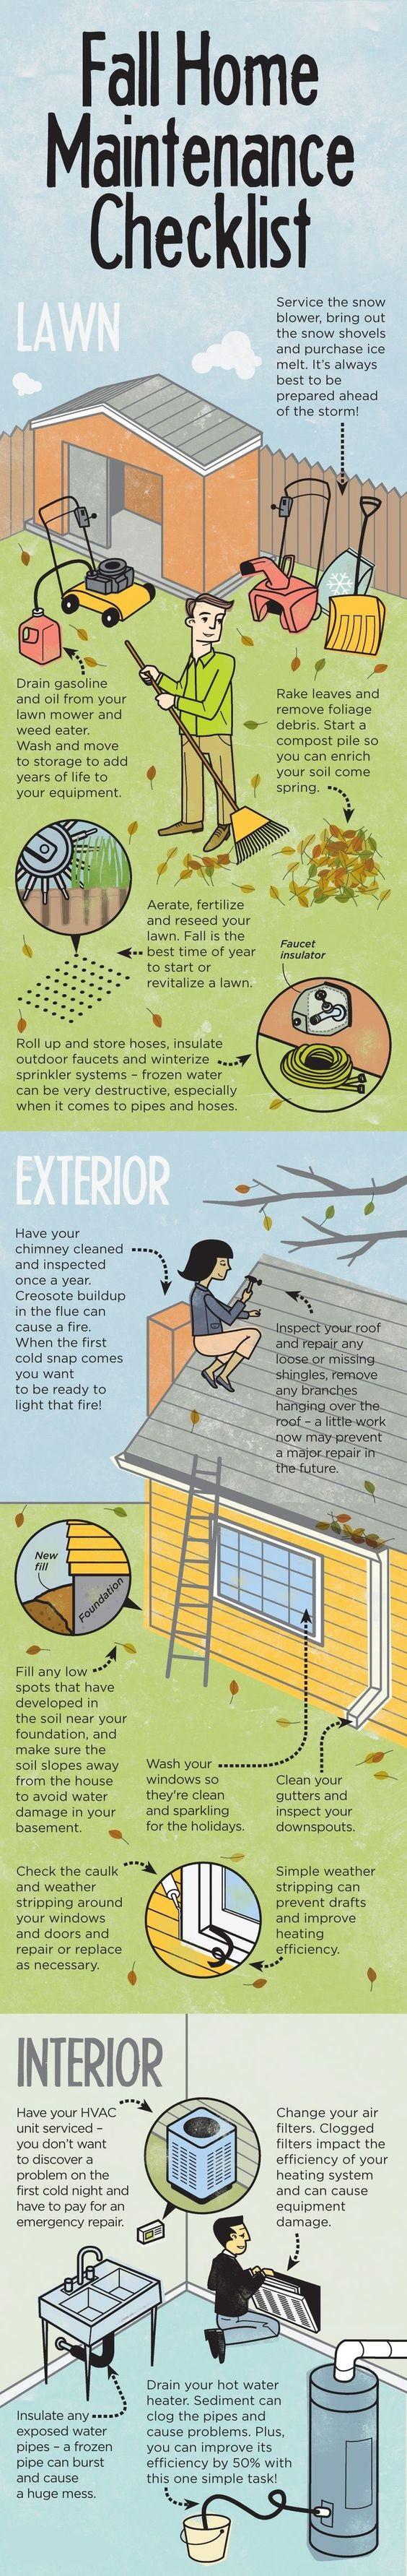 Fall Time Home Maintenance